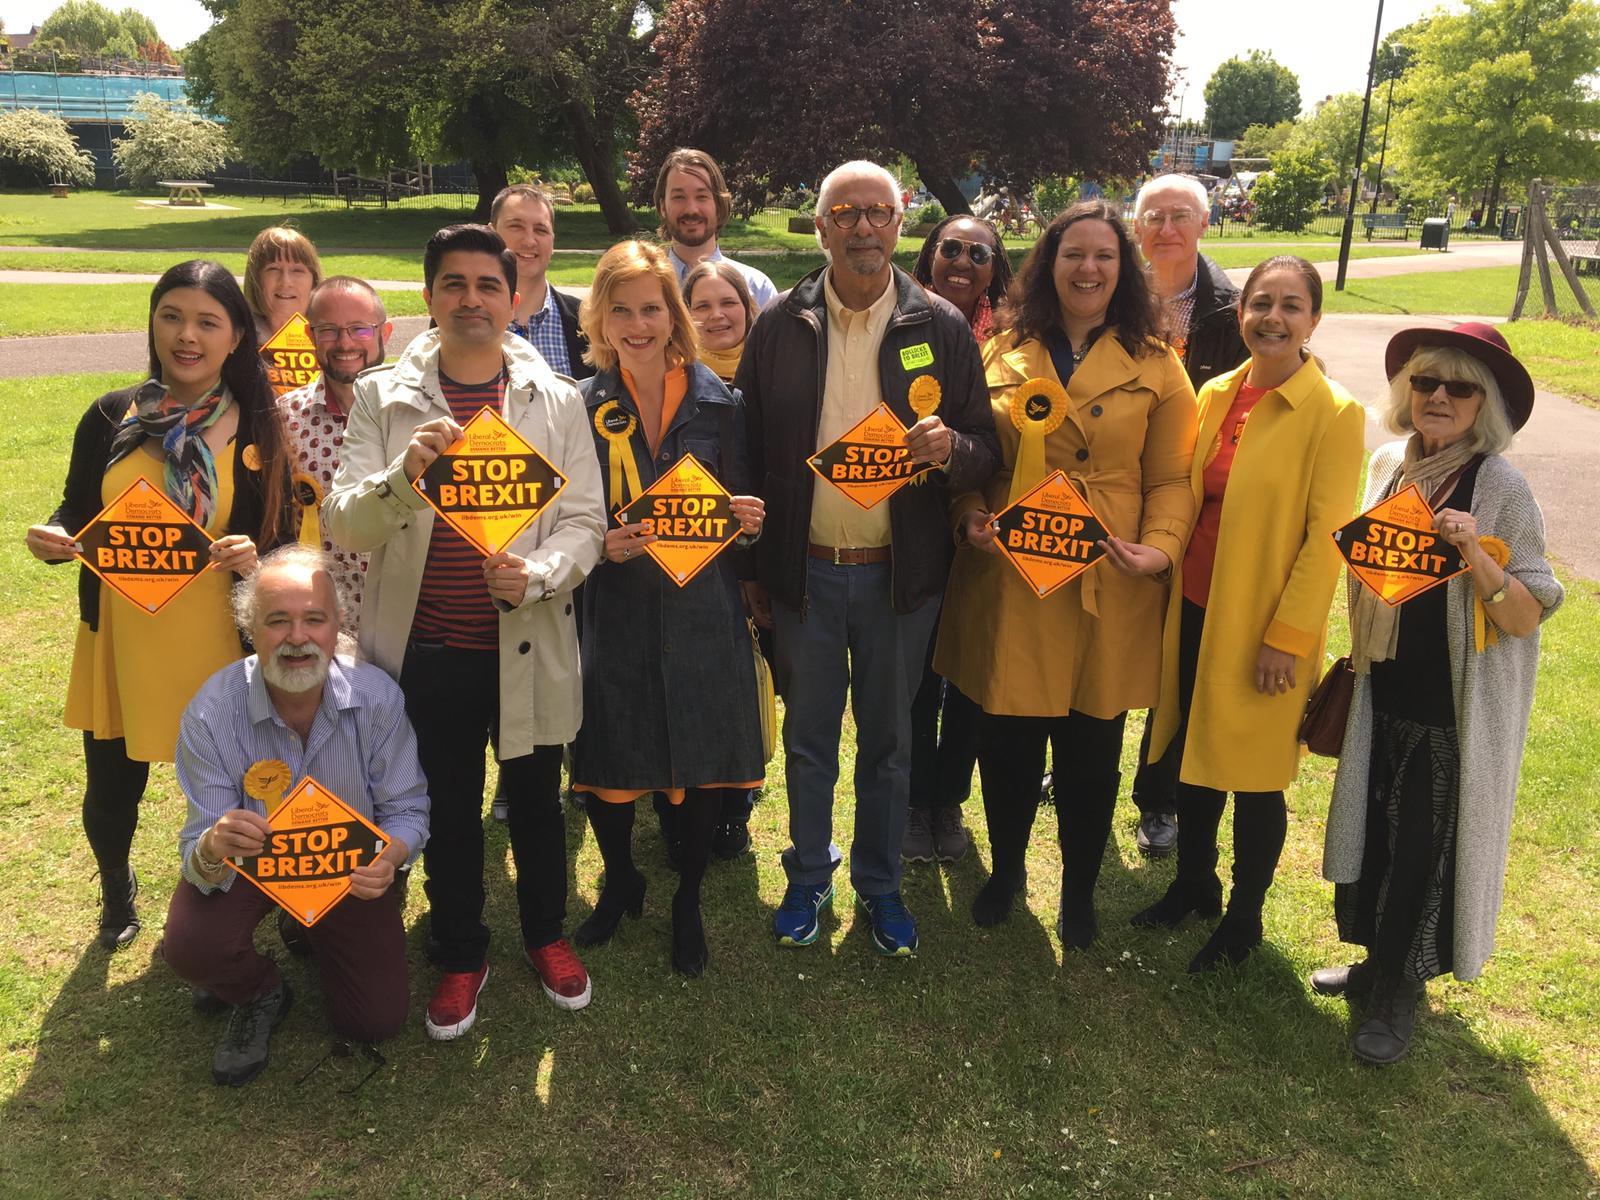 Lib Dem campaigners spread pro-Europe message across London